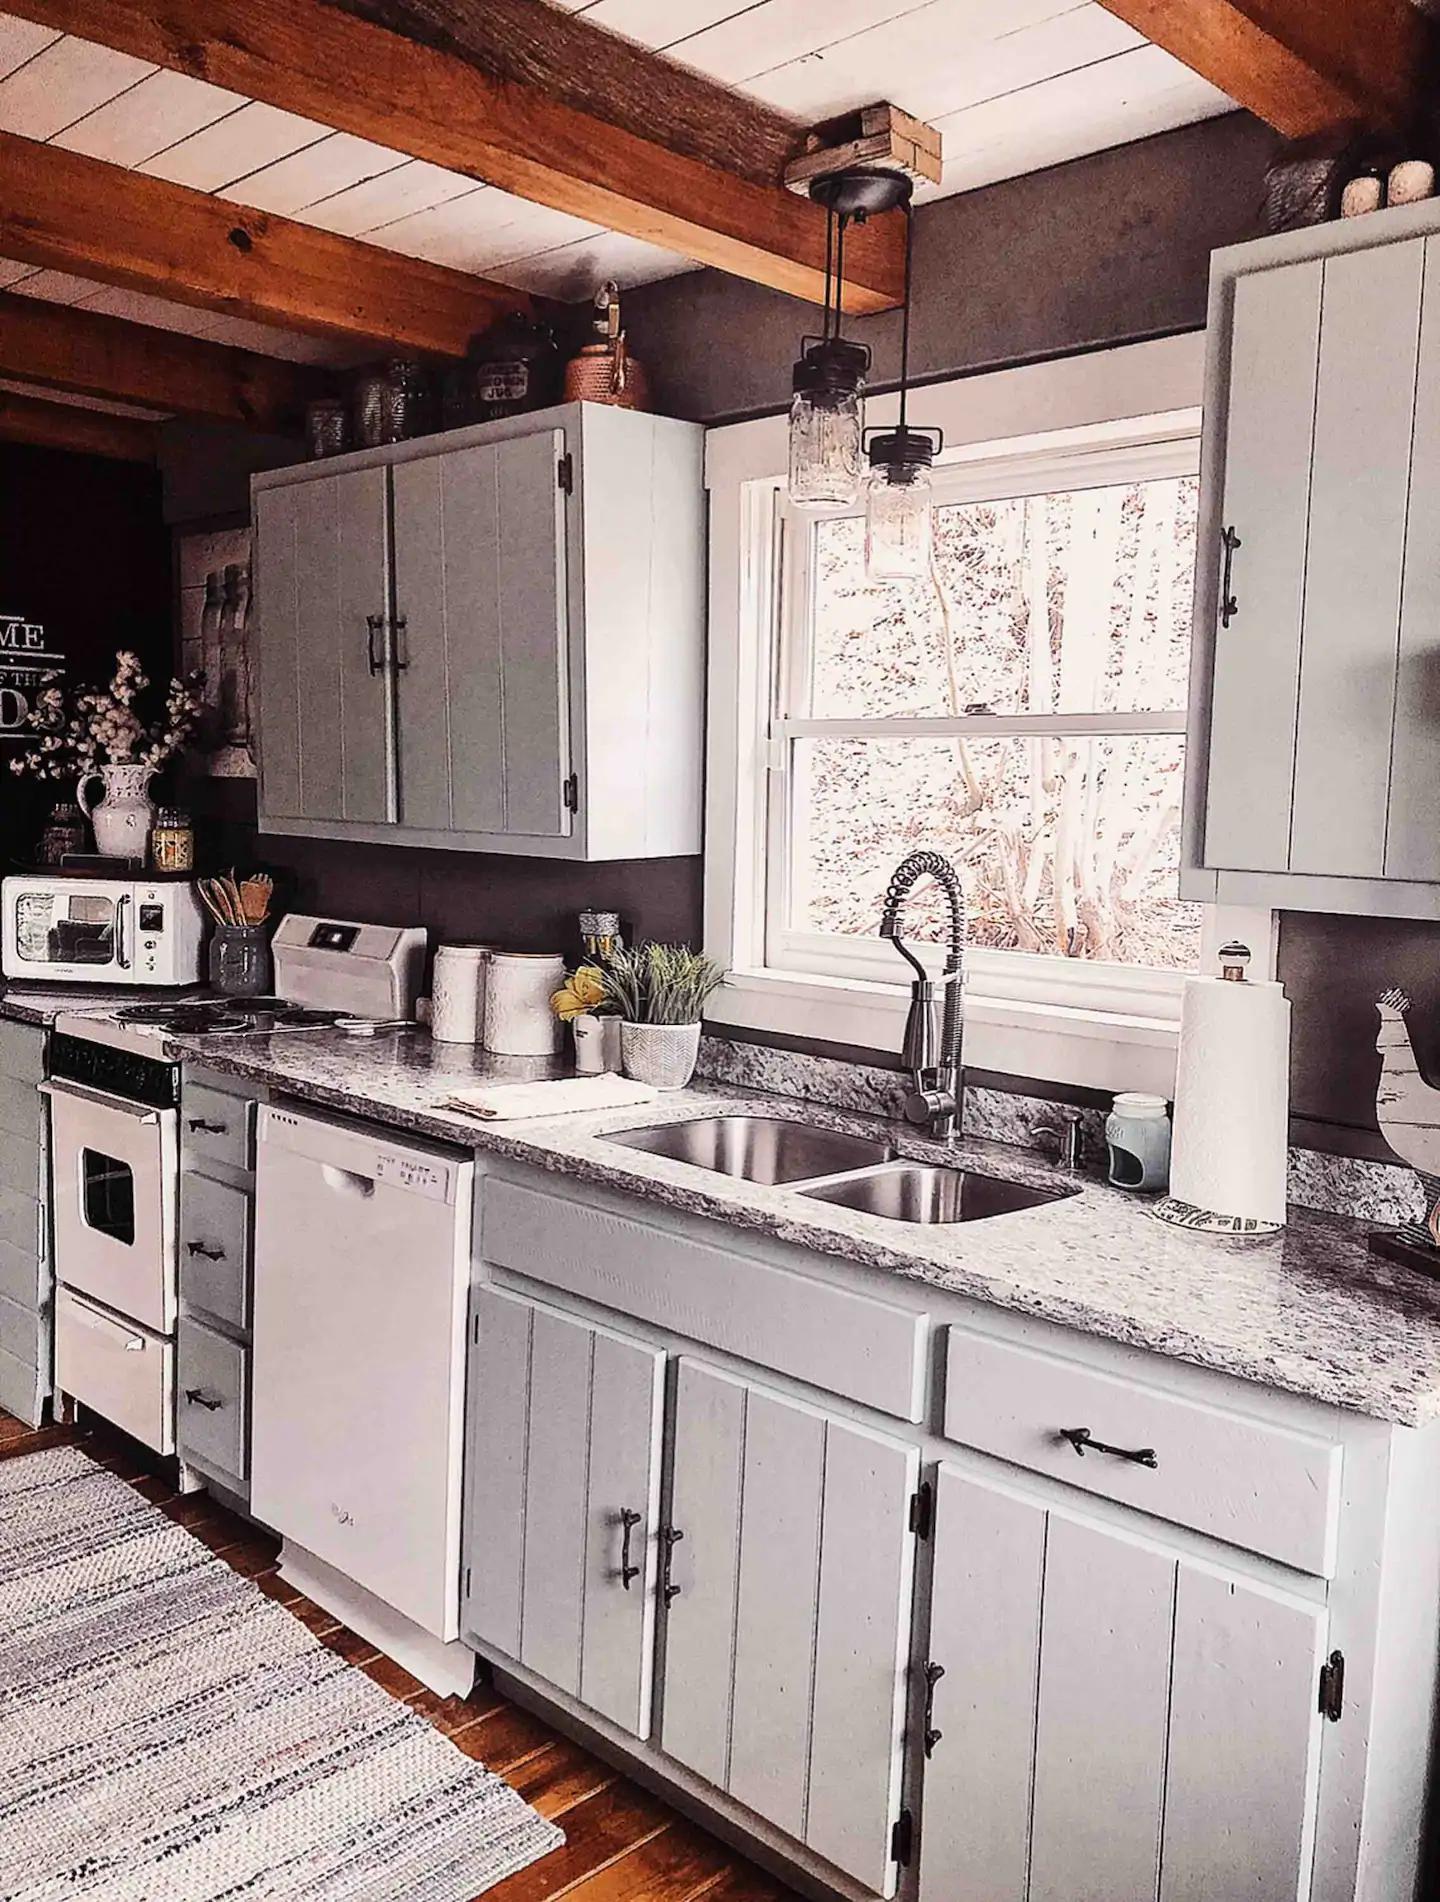 Tennessee Homemade Wines Airbnb mason jar lodge kitchen